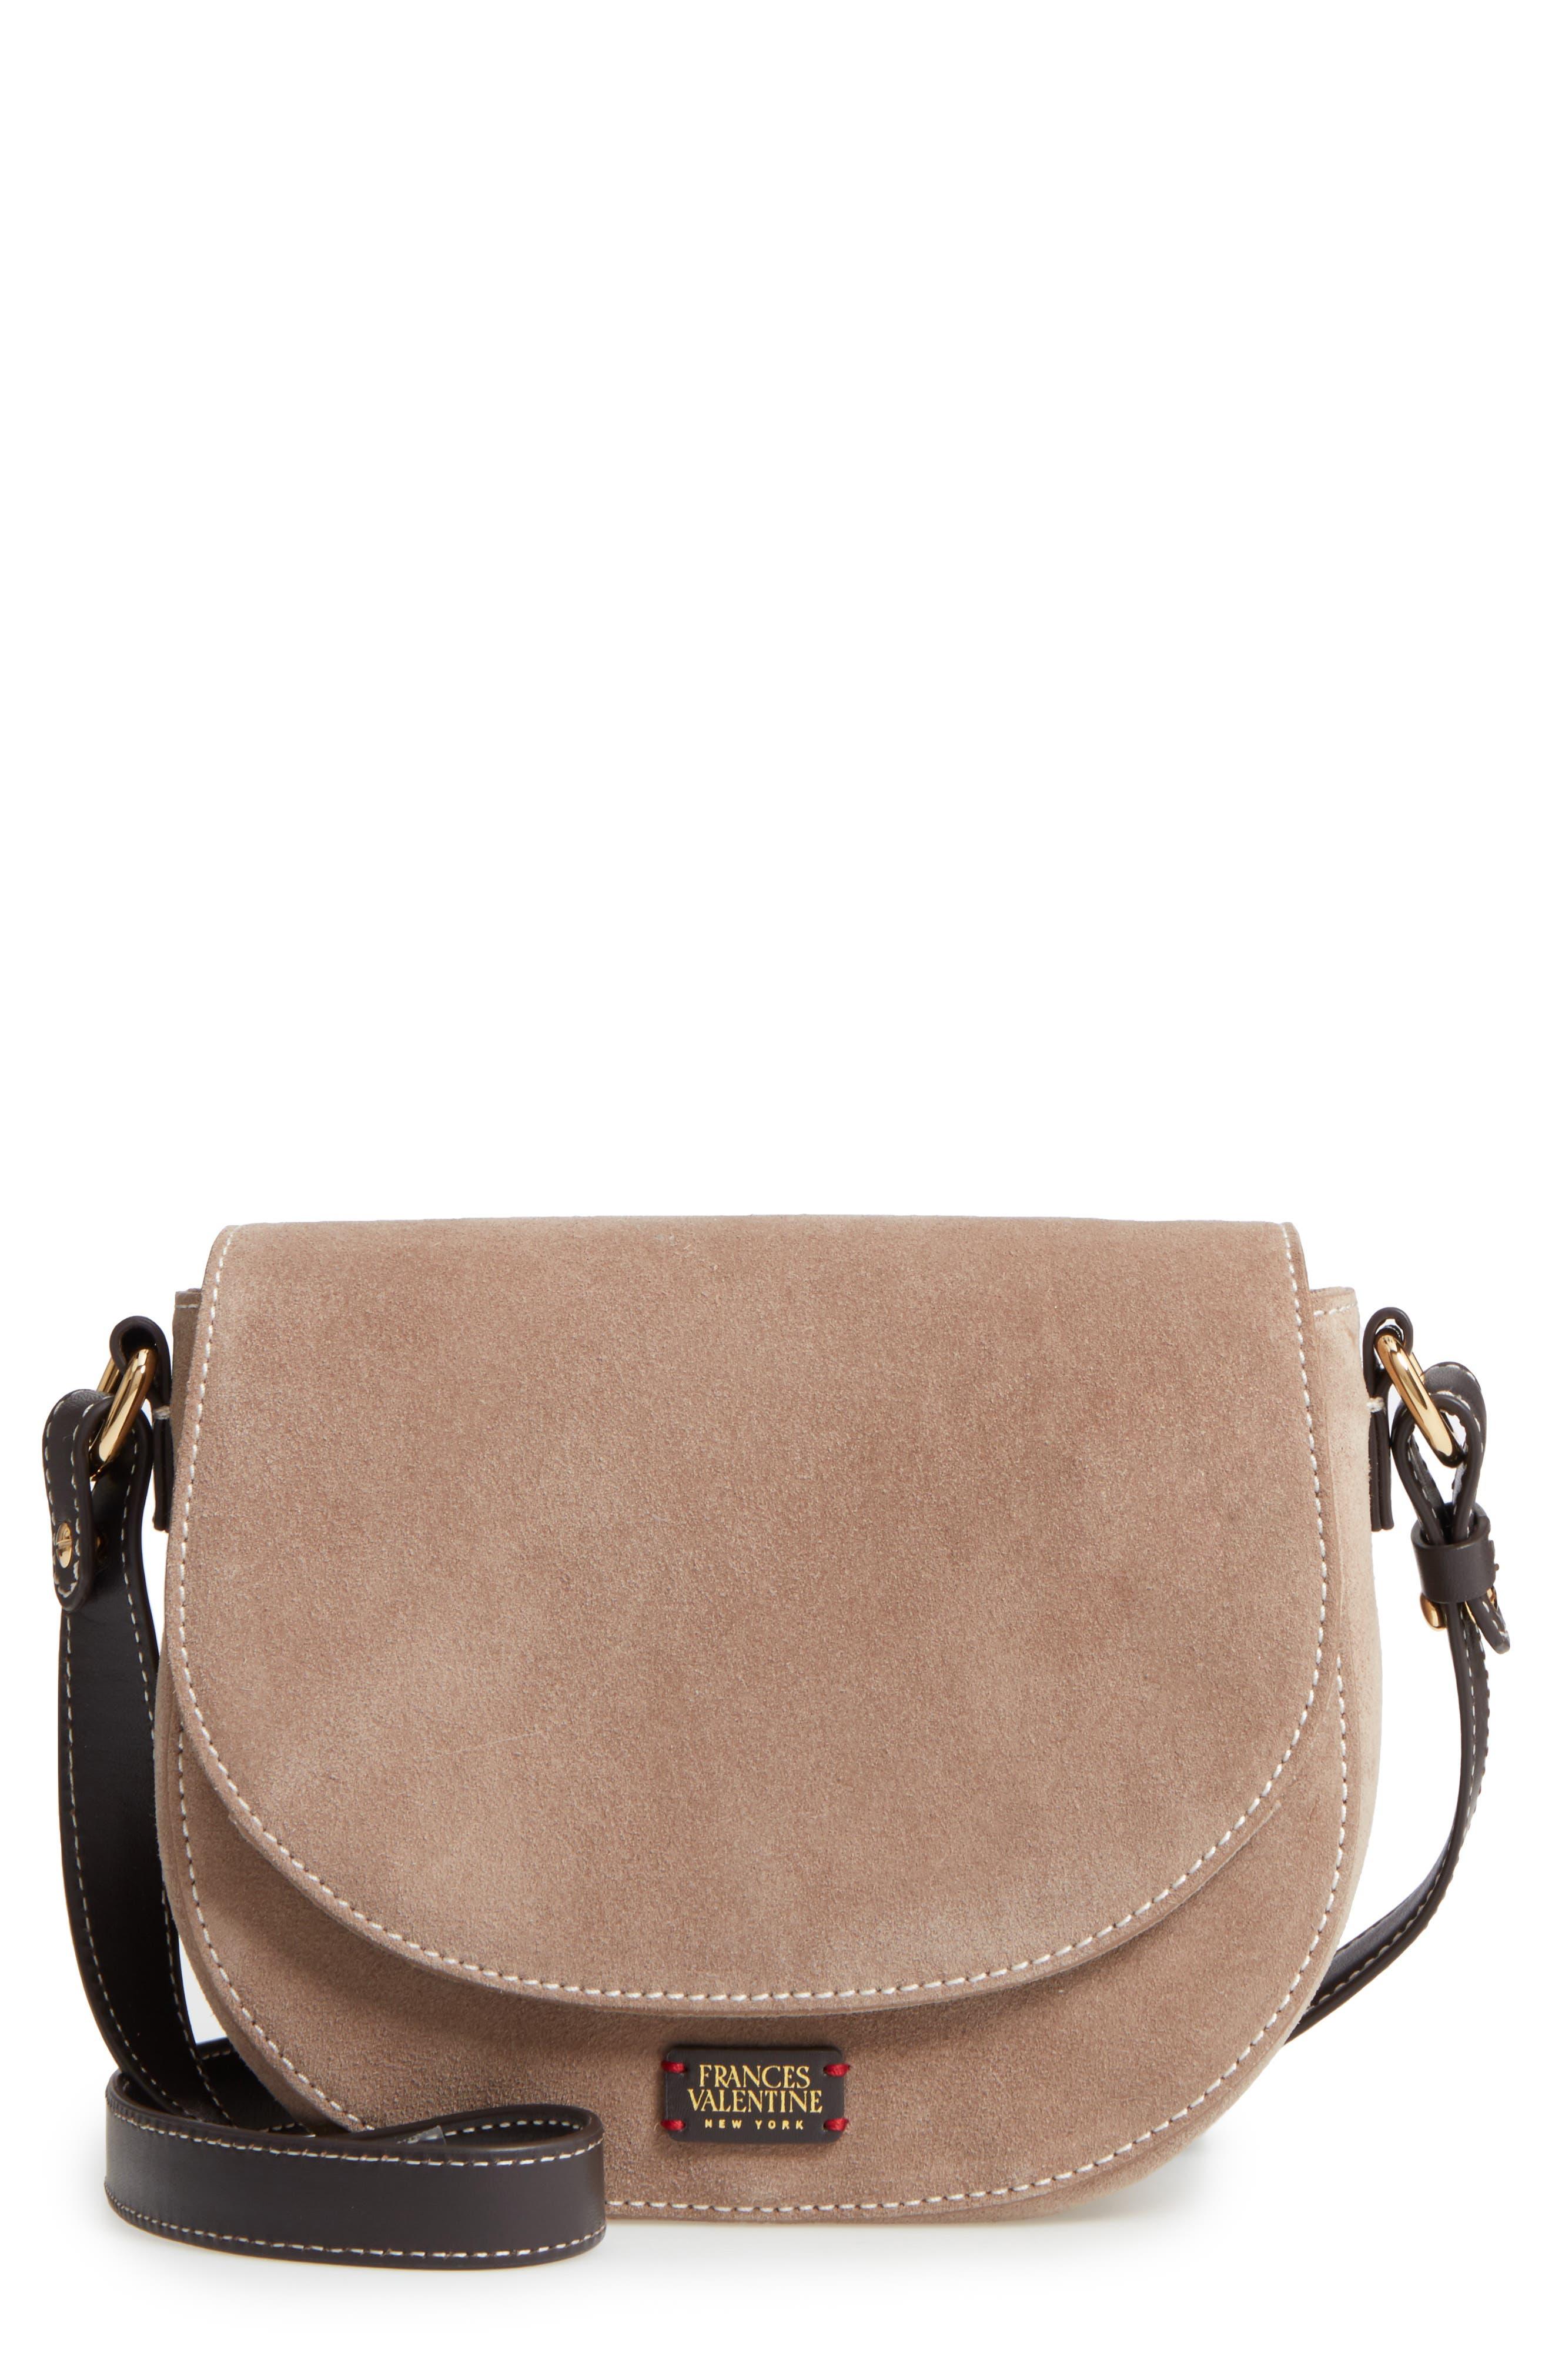 FRANCES VALENTINE Mini Ellen Suede Crossbody Bag